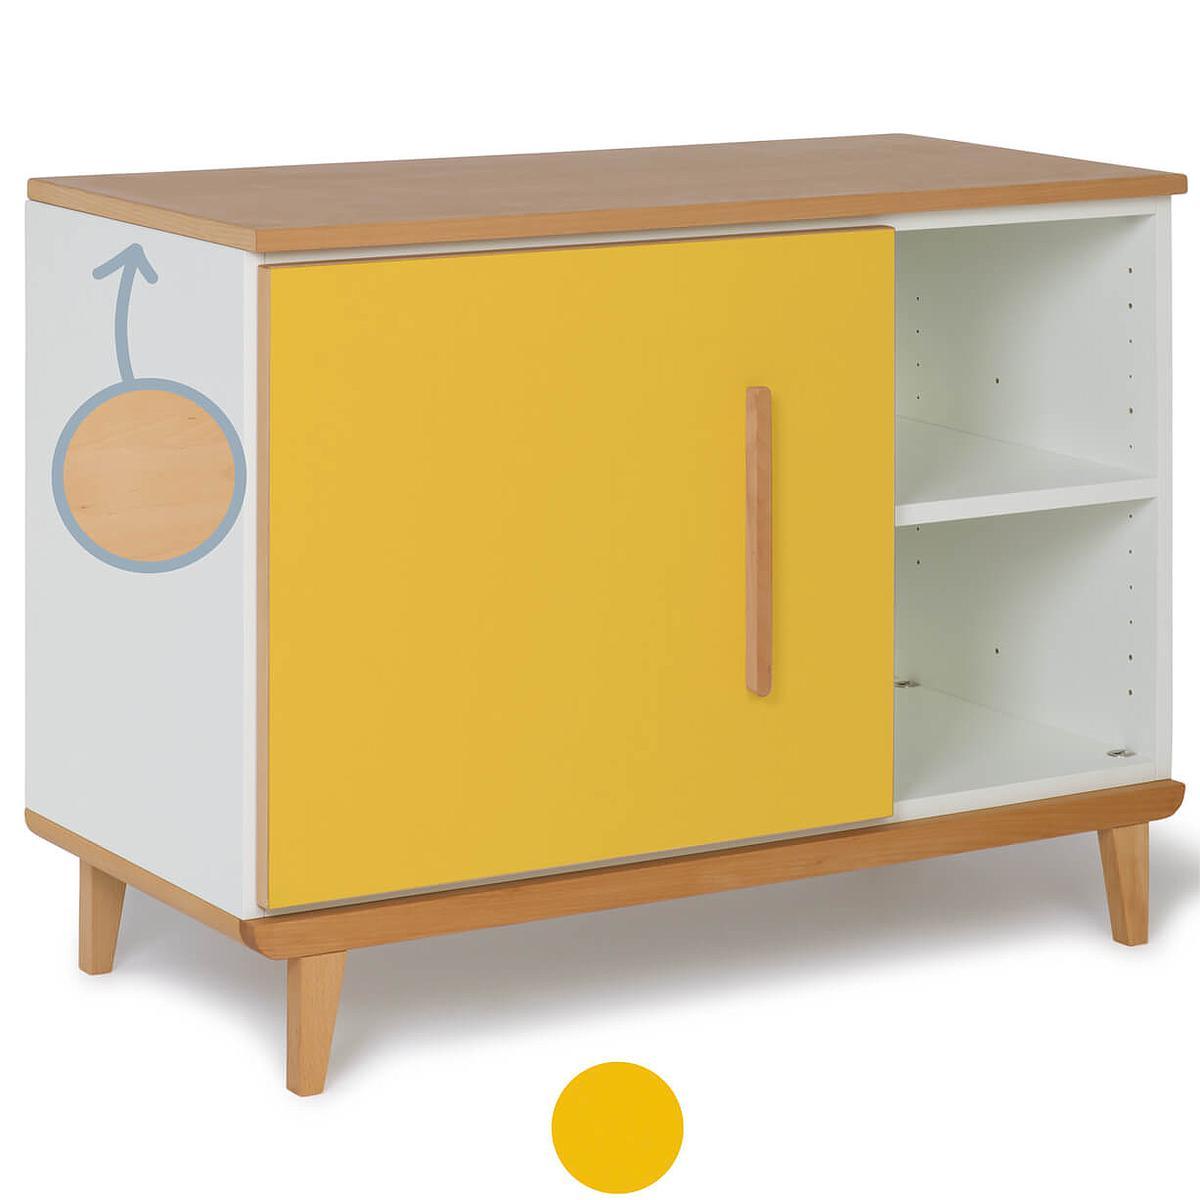 Kleinmöbel 1-türig NADO By A.K. sunshine yellow